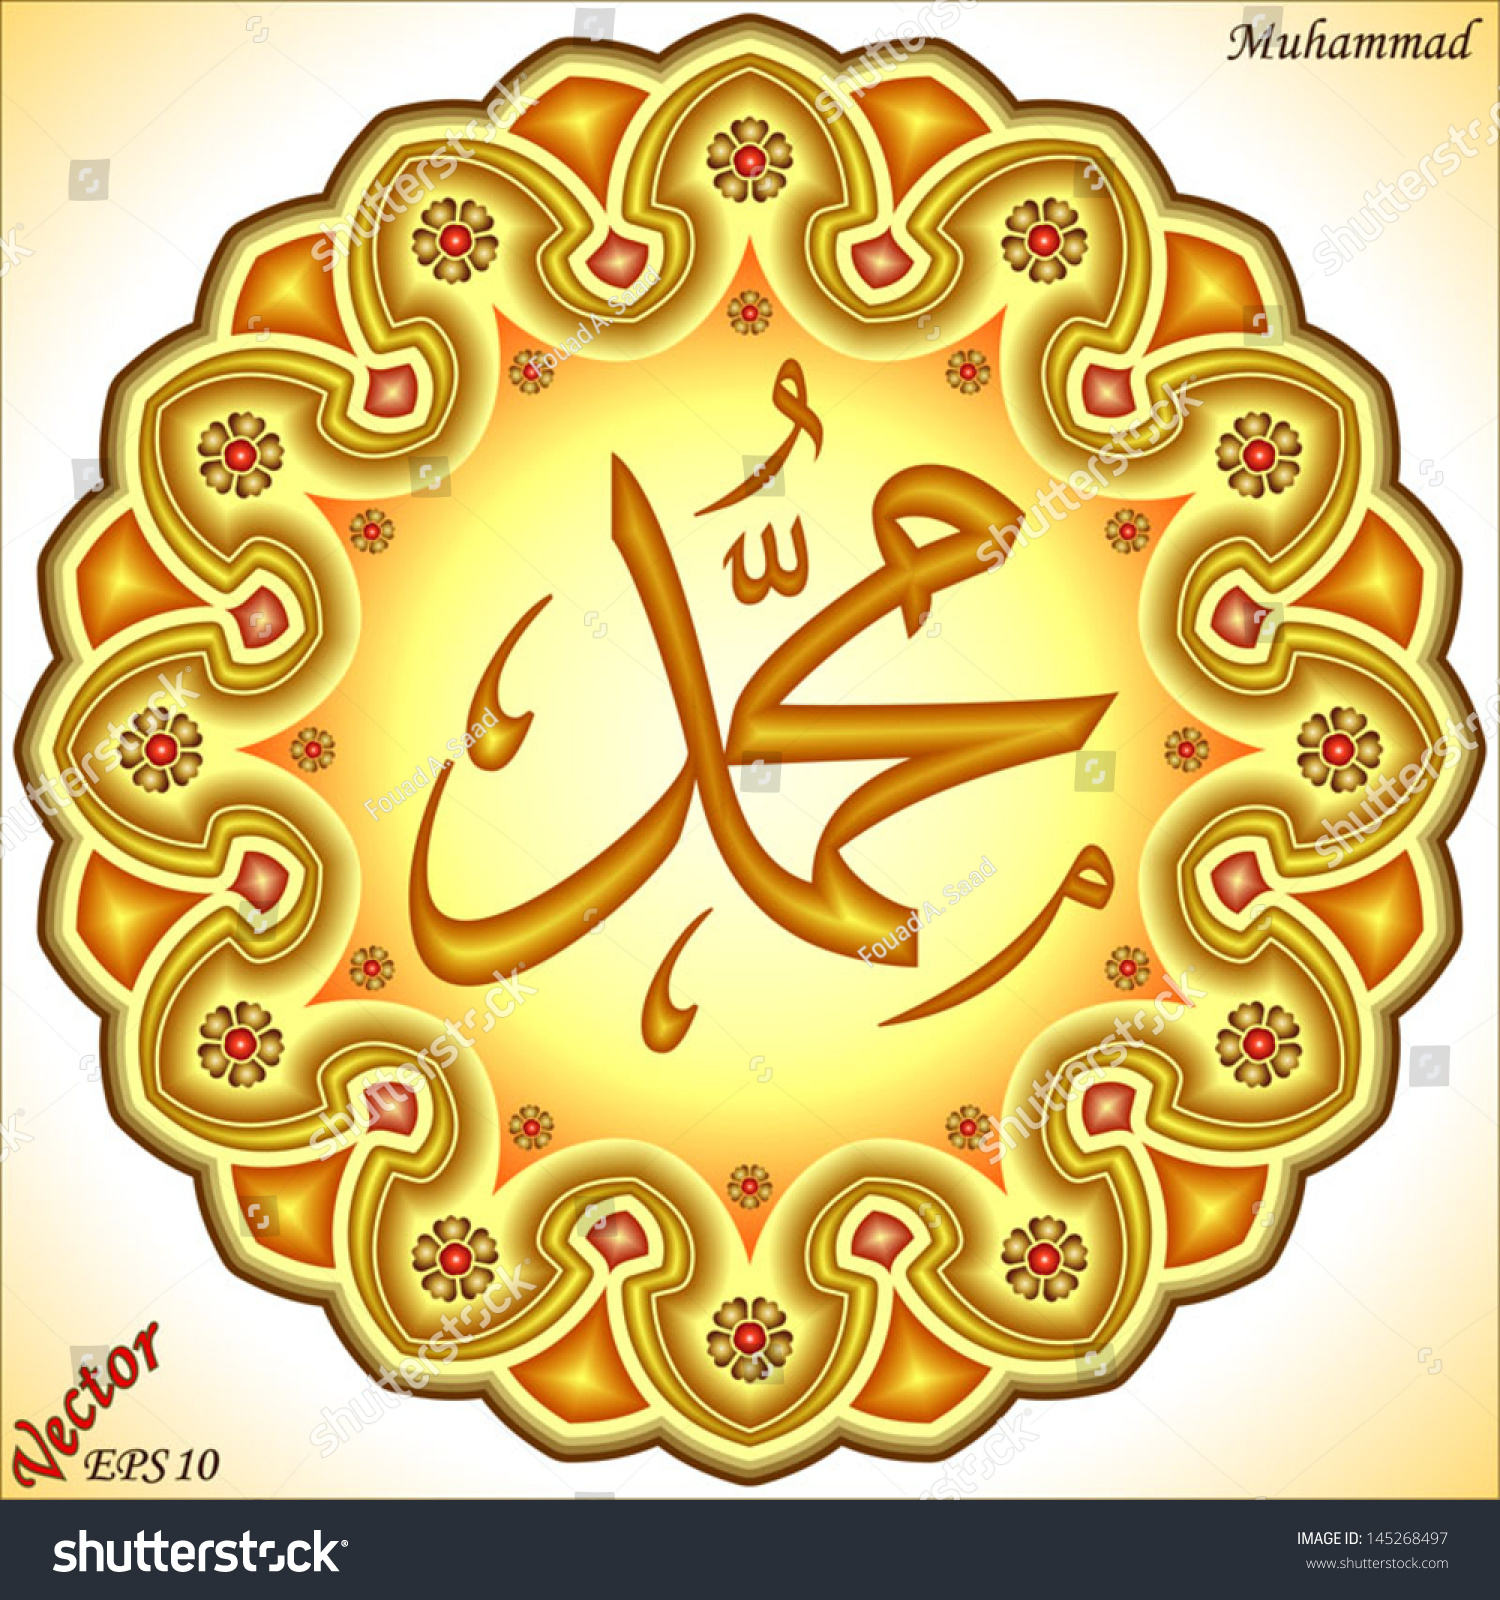 A Brief Biography about our Beloved Prophet Muhammad Stock-vector-prophet-muhammad-al-mustafa-145268497